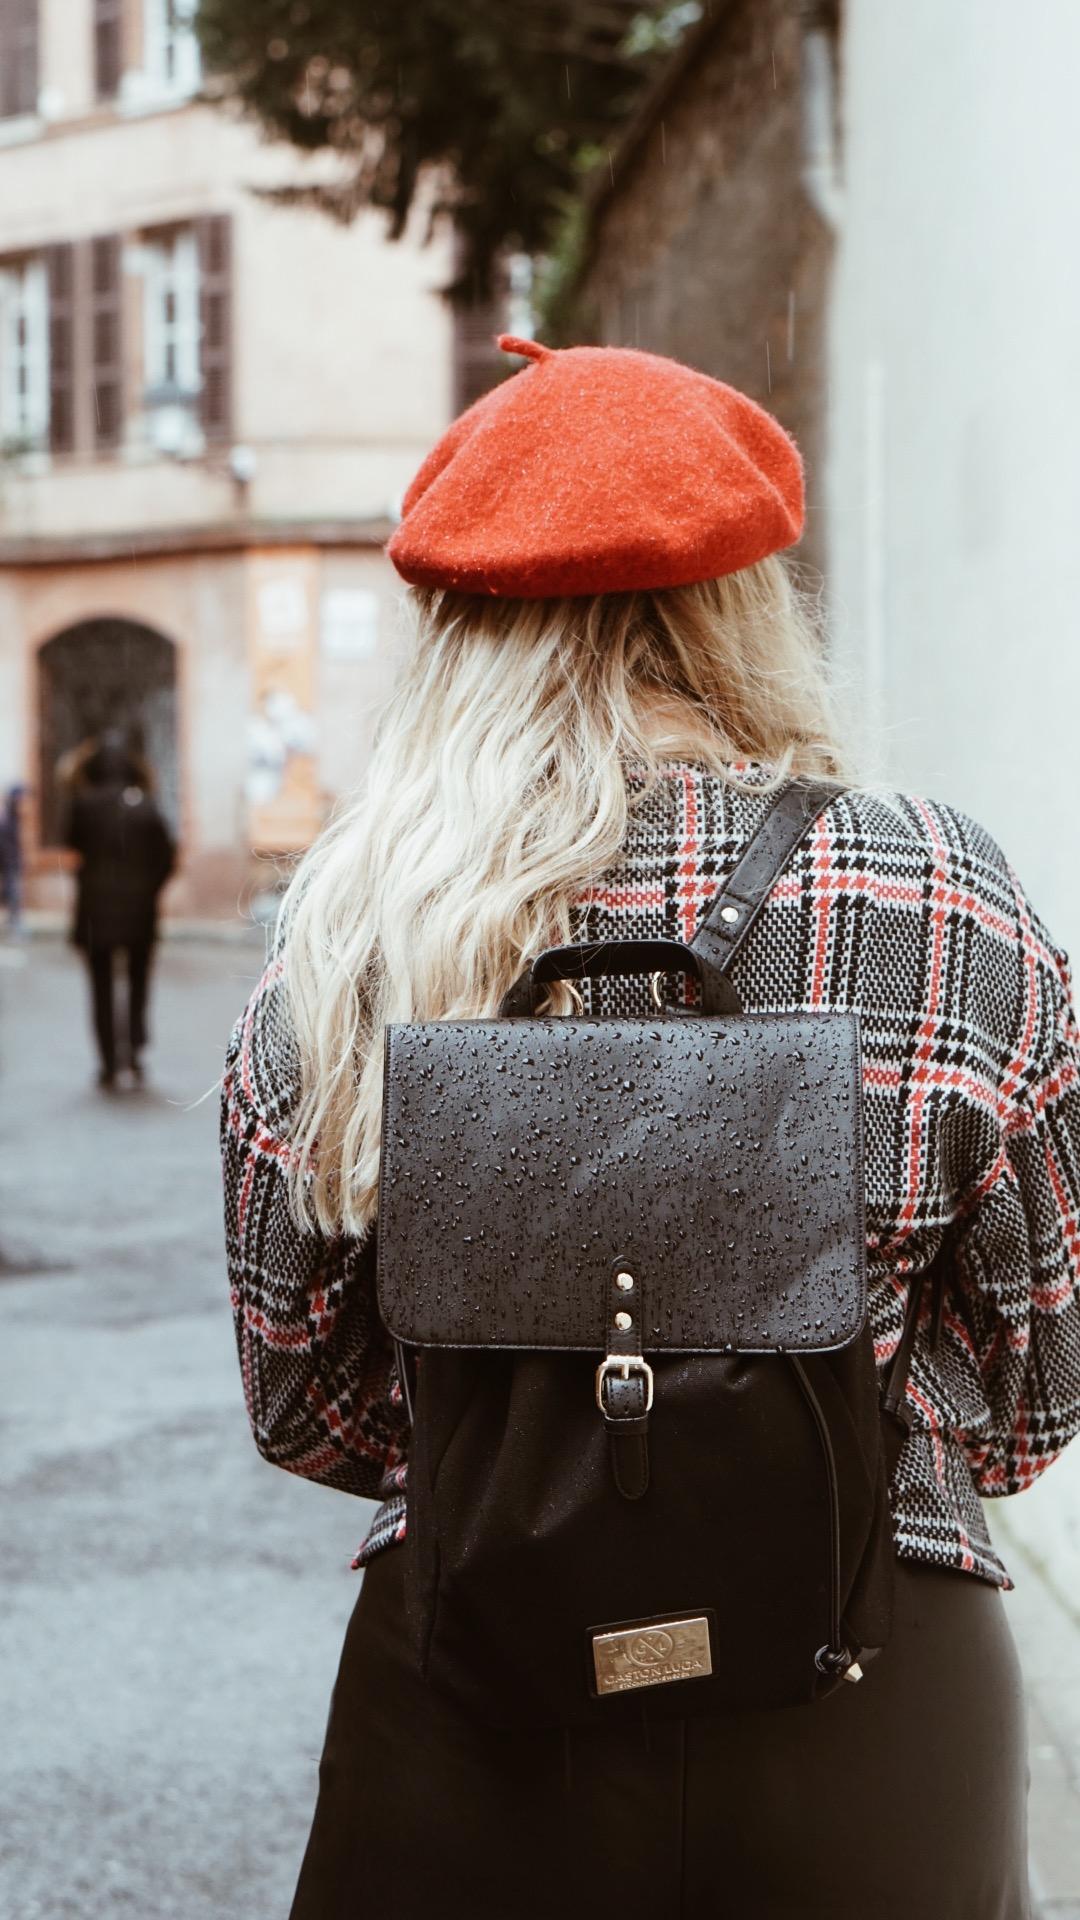 Gaston Luga Backpack Beret BonjourBlondie